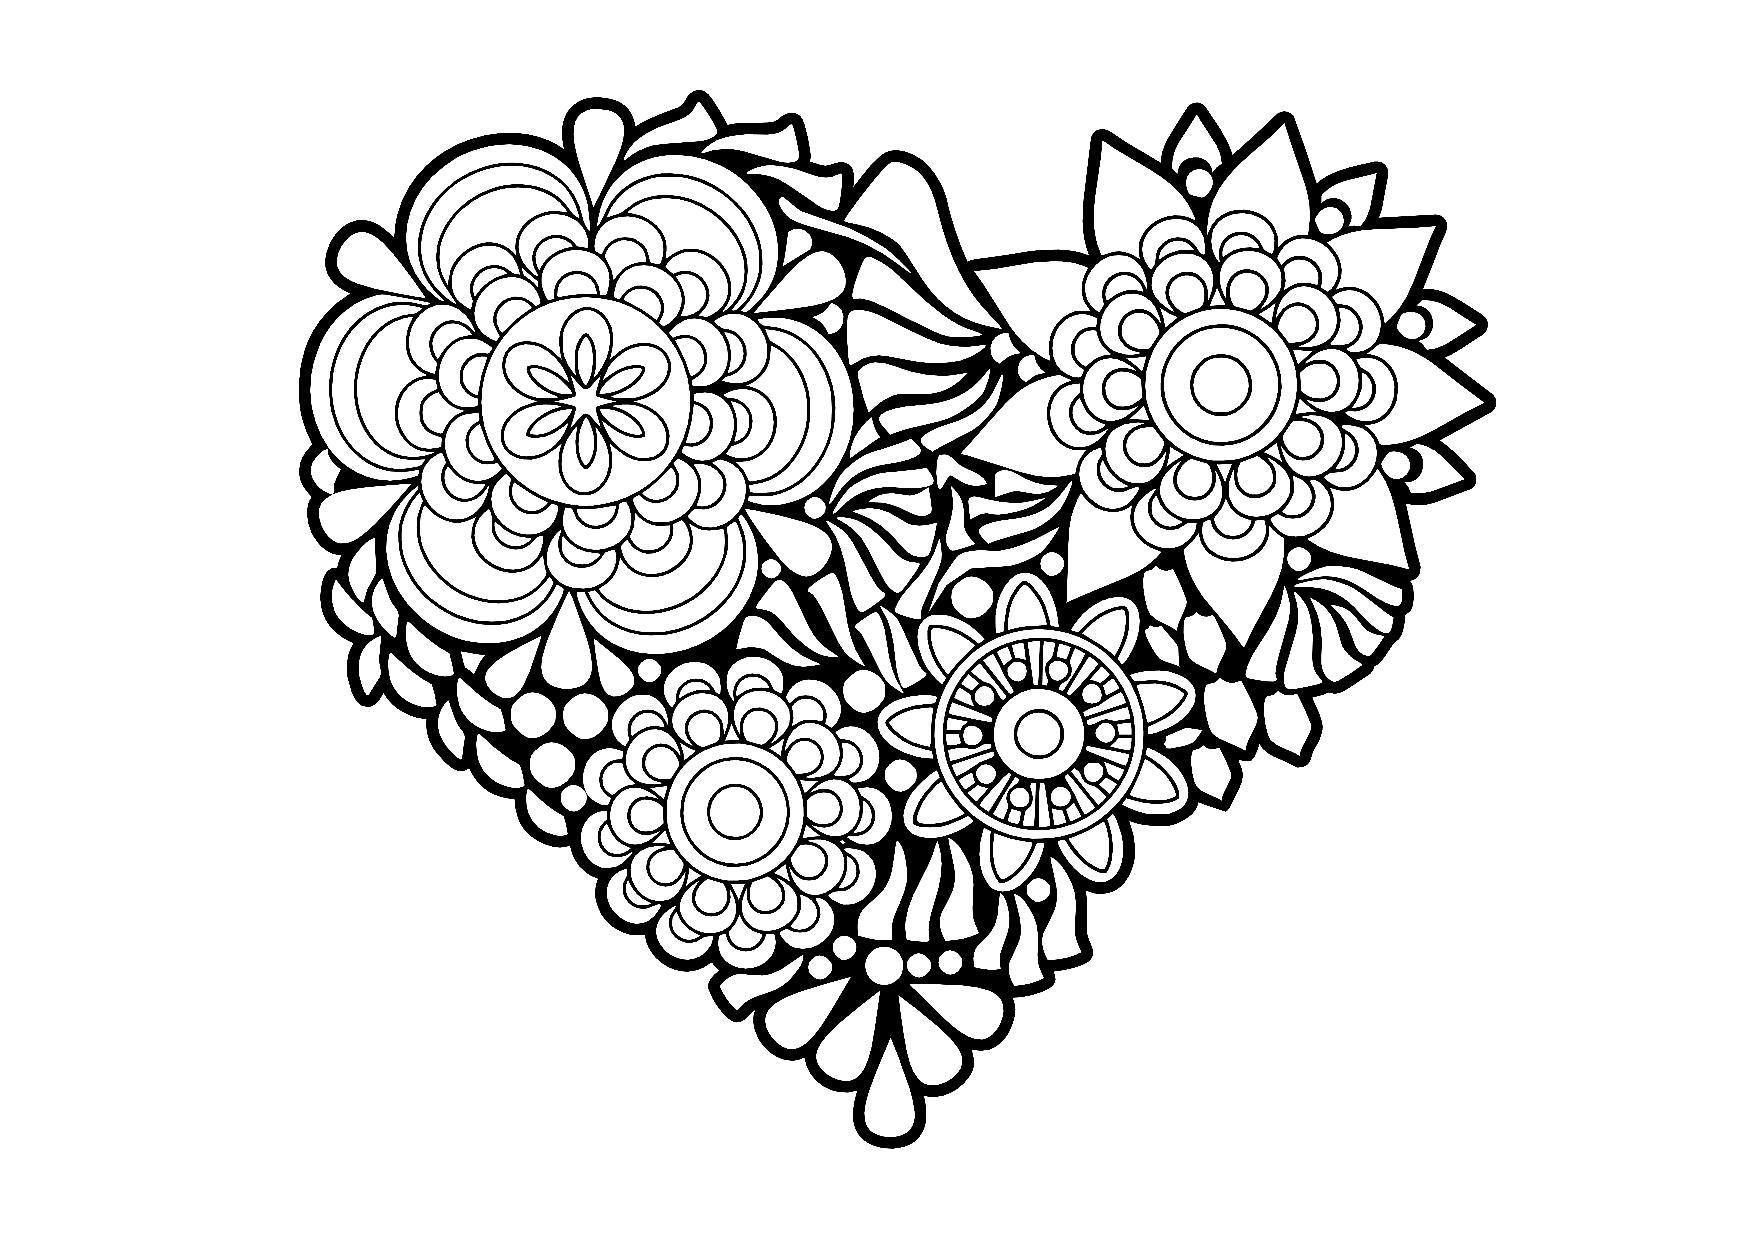 Silhouette plotter file free plotter datei kostenlos plotter freebie herz heart doodles - Silhouette cameo vorlagen ...